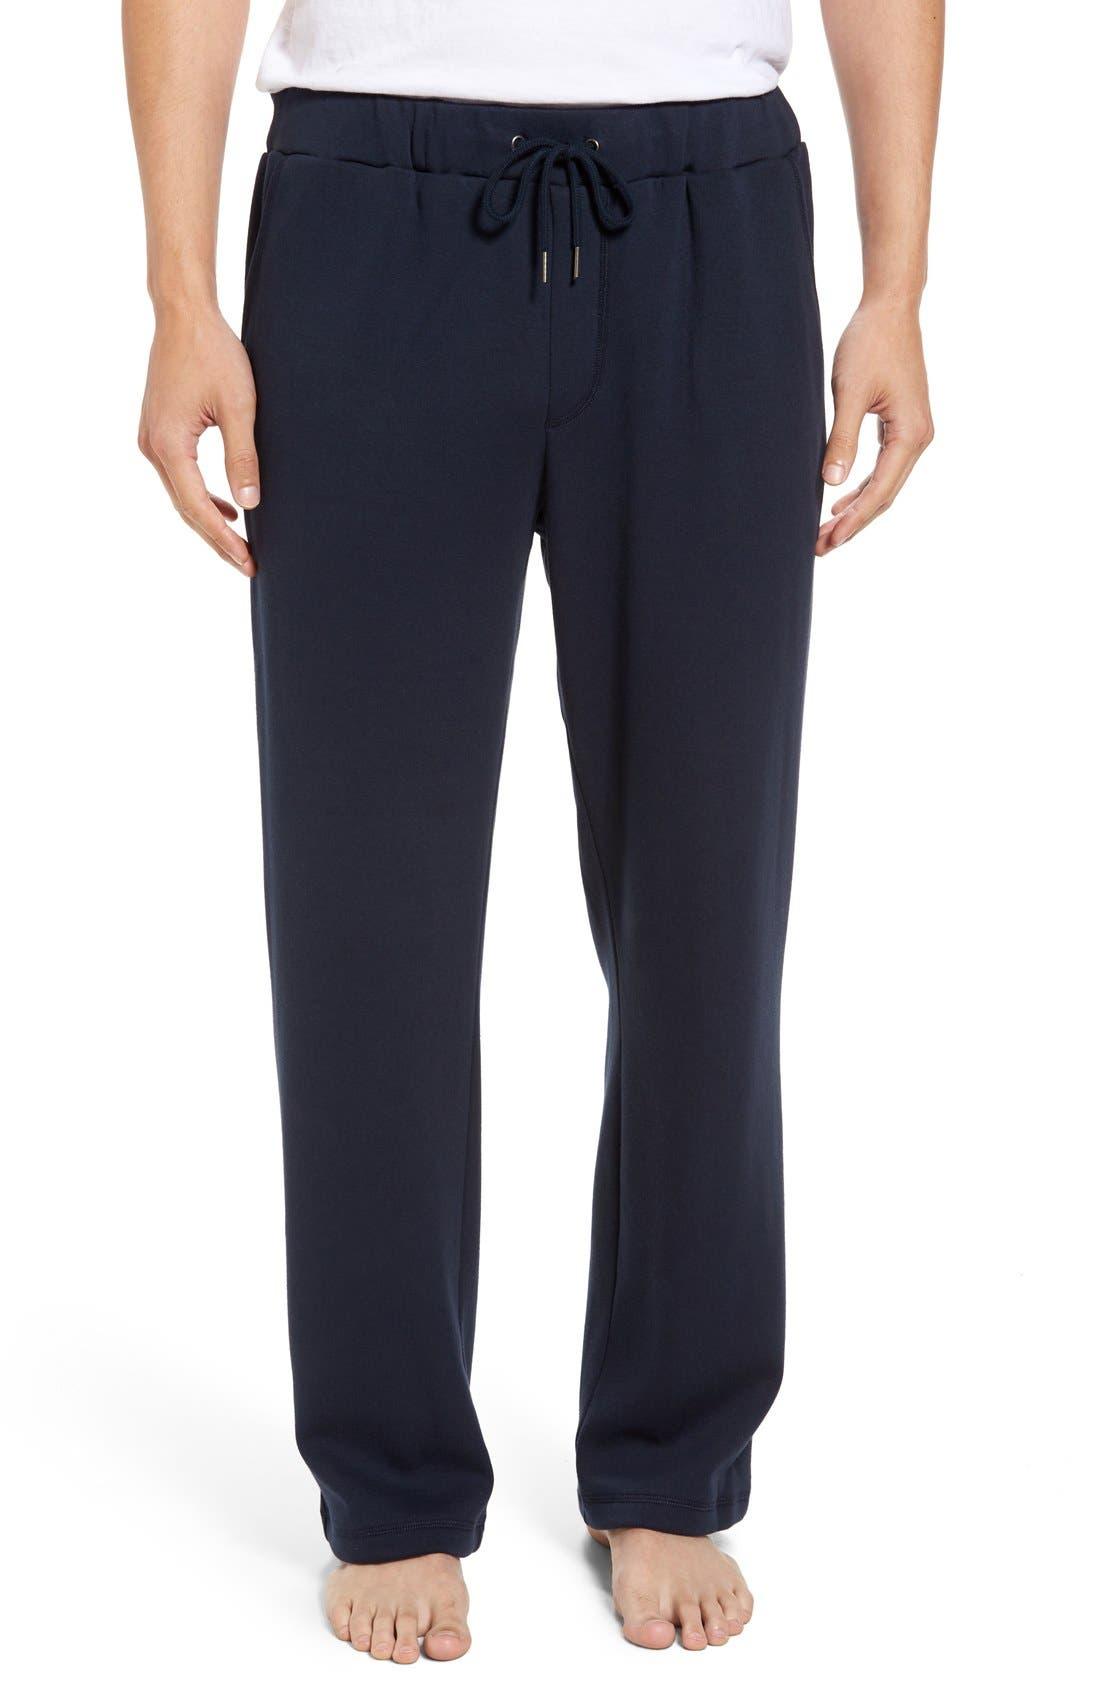 Alternate Image 1 Selected - Nordstrom Men's Shop Fleece Lounge Pants